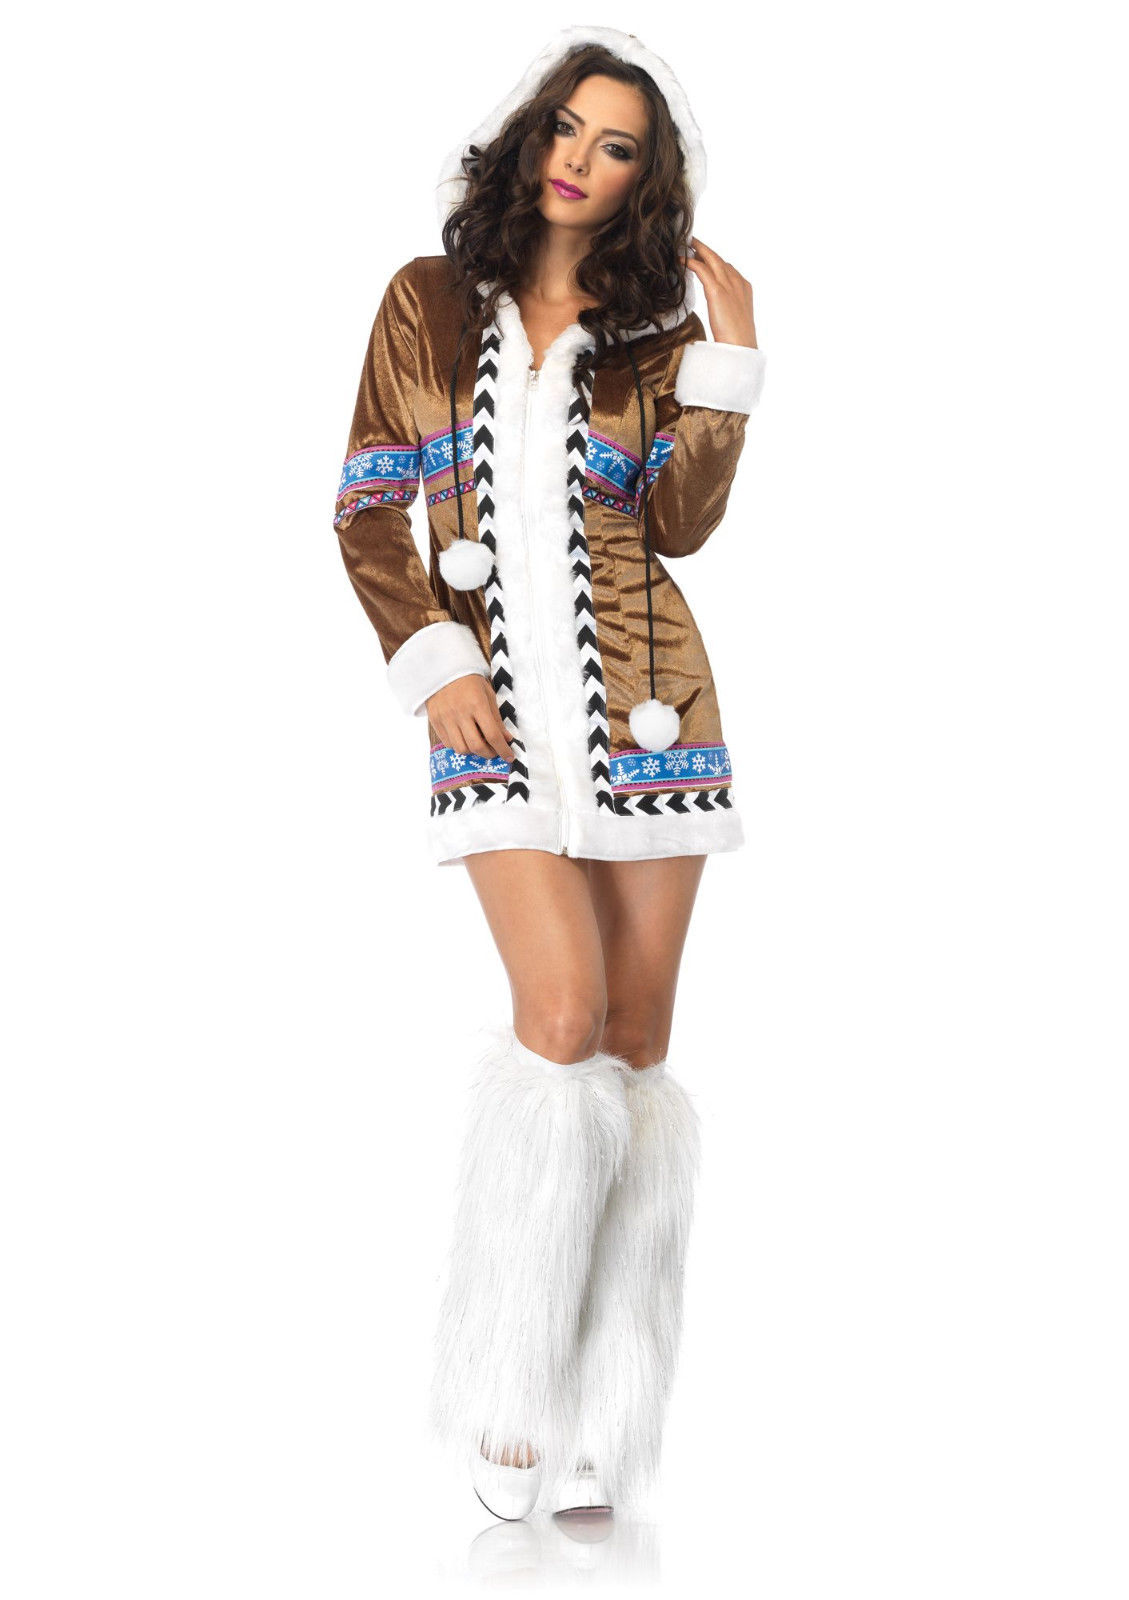 Street style halloween costume inspiration